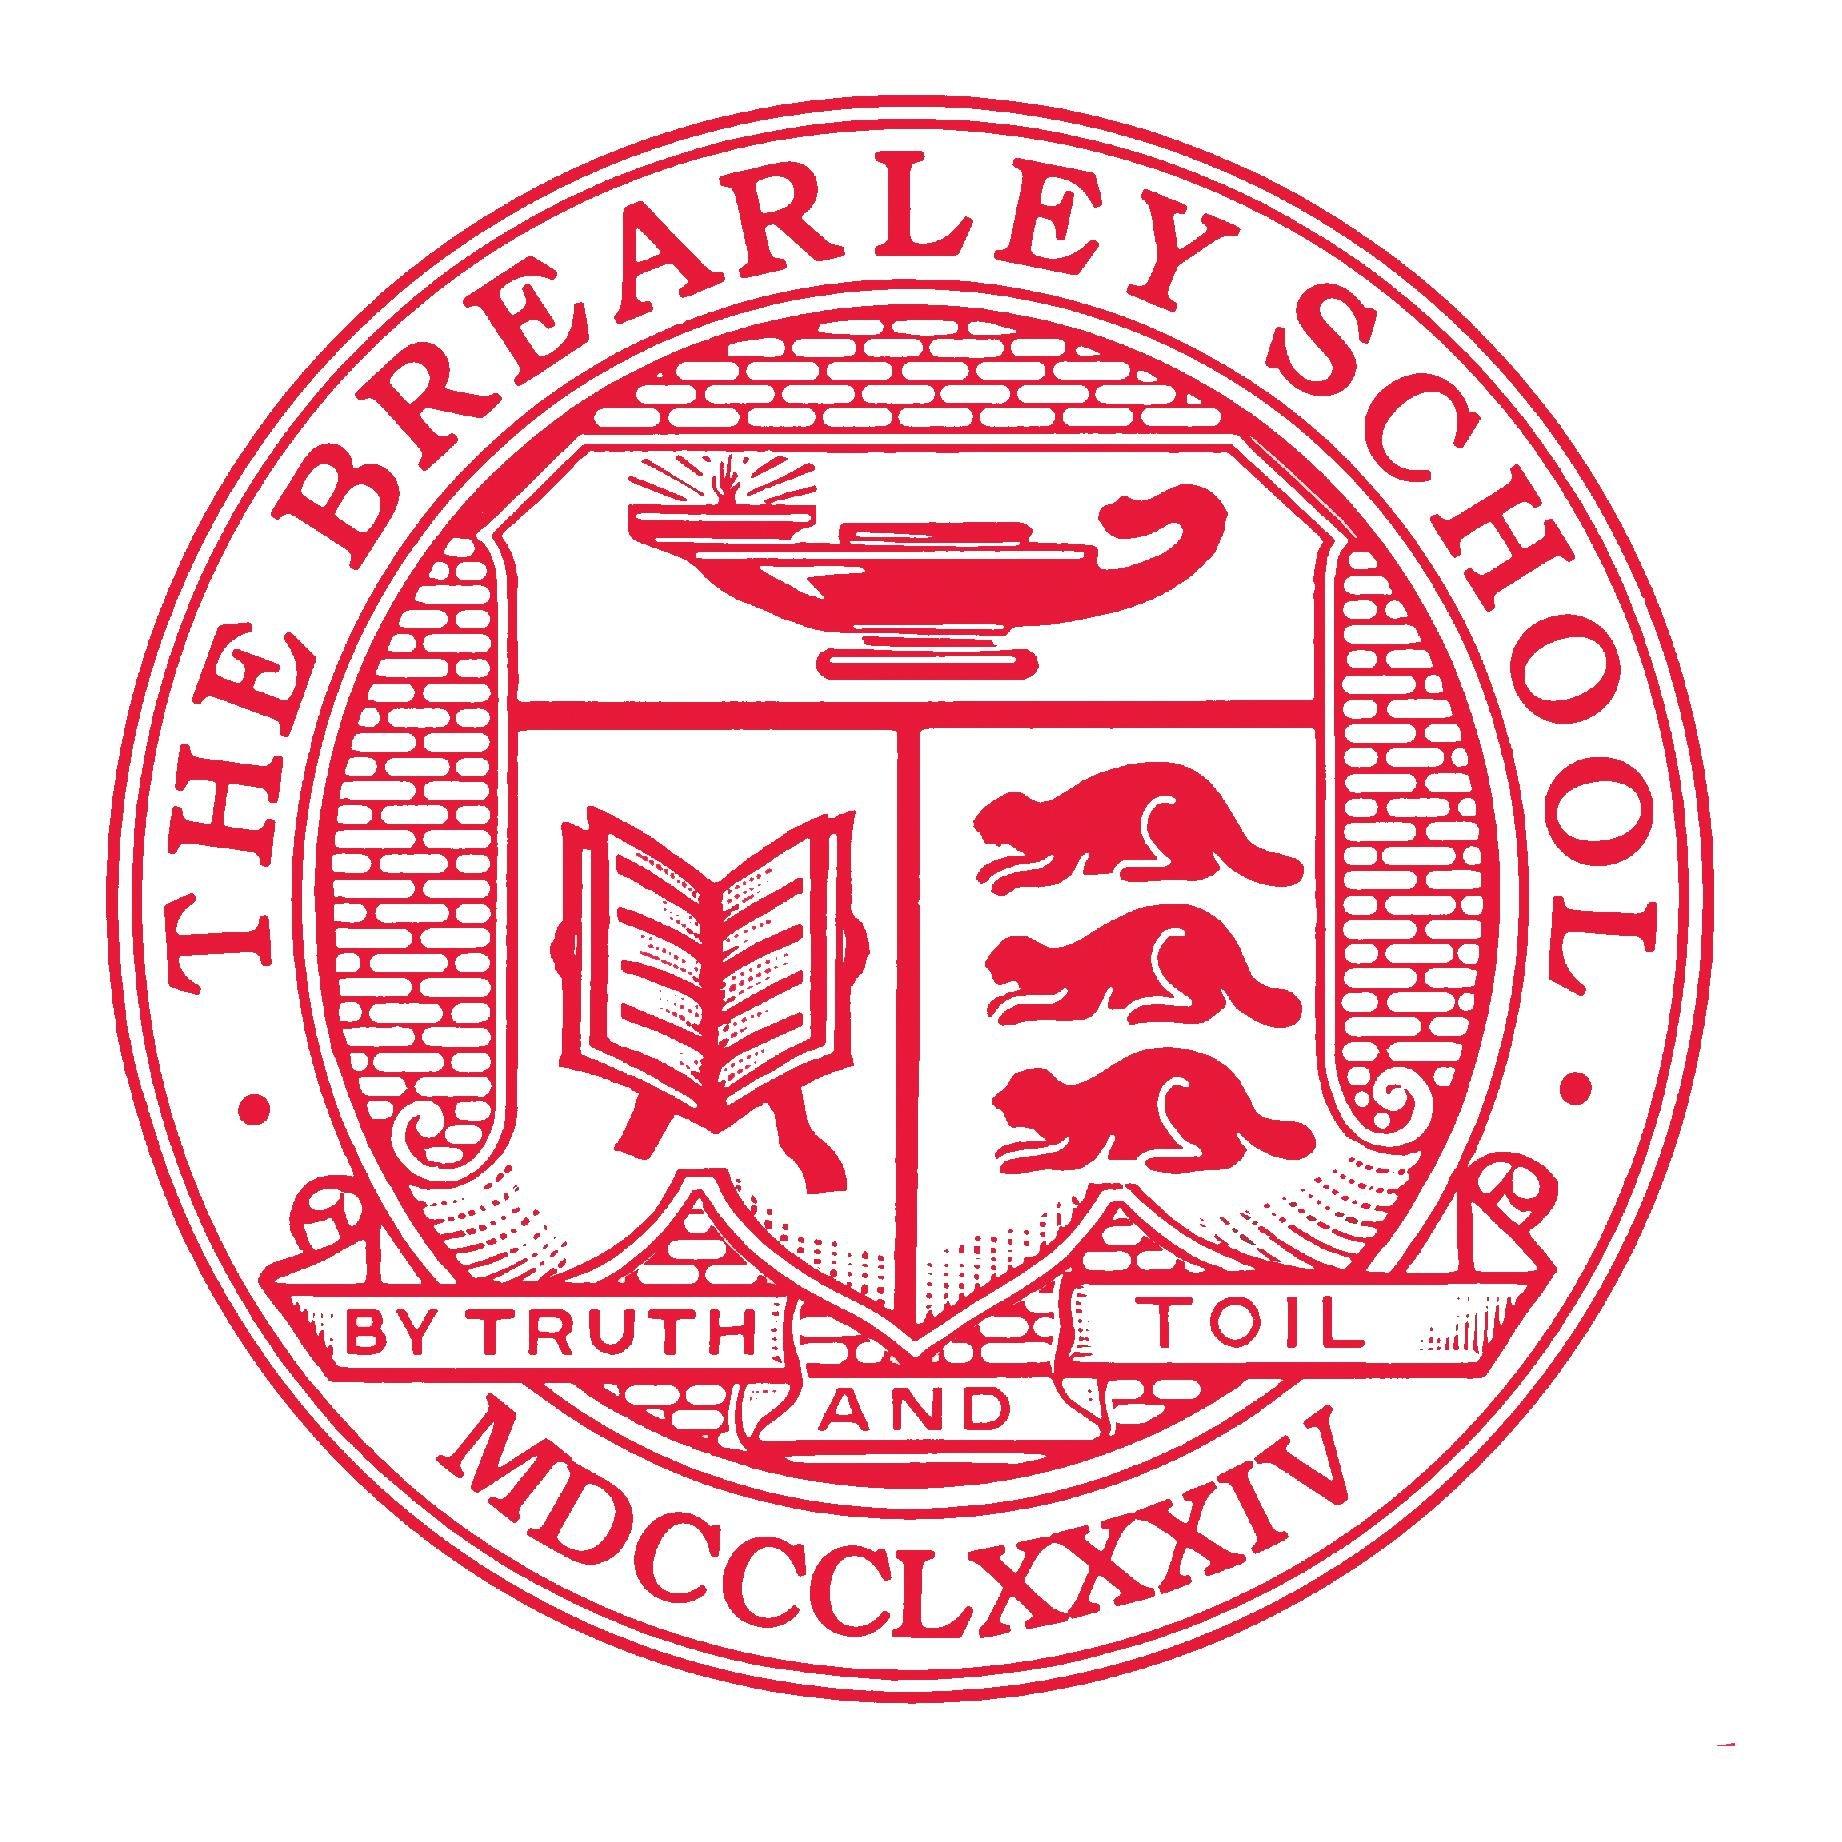 Brearley School logo